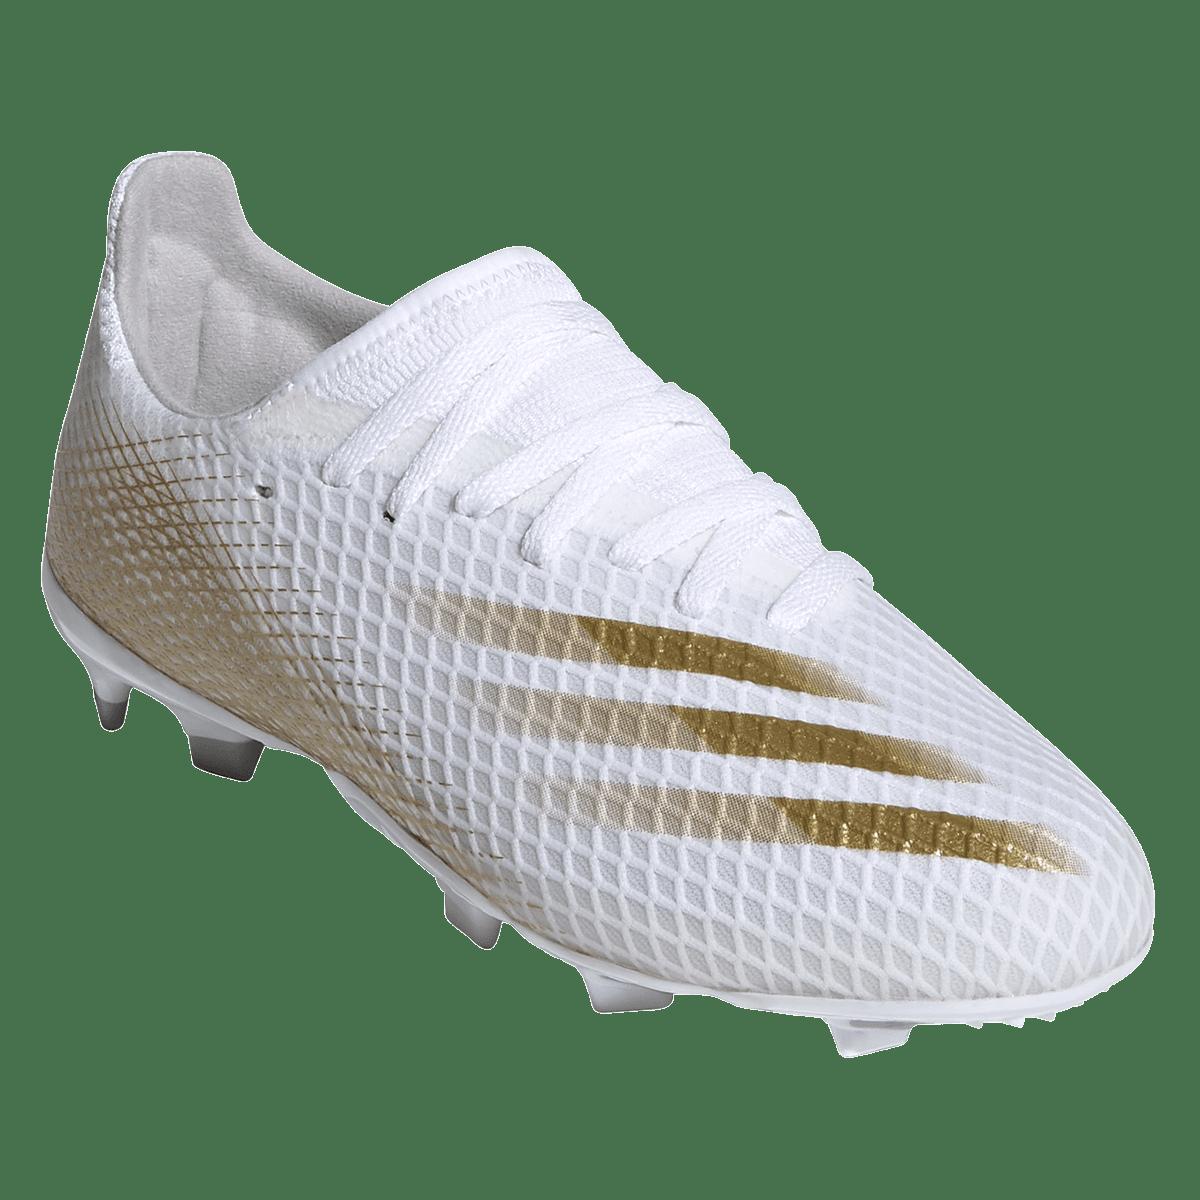 Chaussure de football adidas pour enfants X Ghosted.3 FG J blanc / or